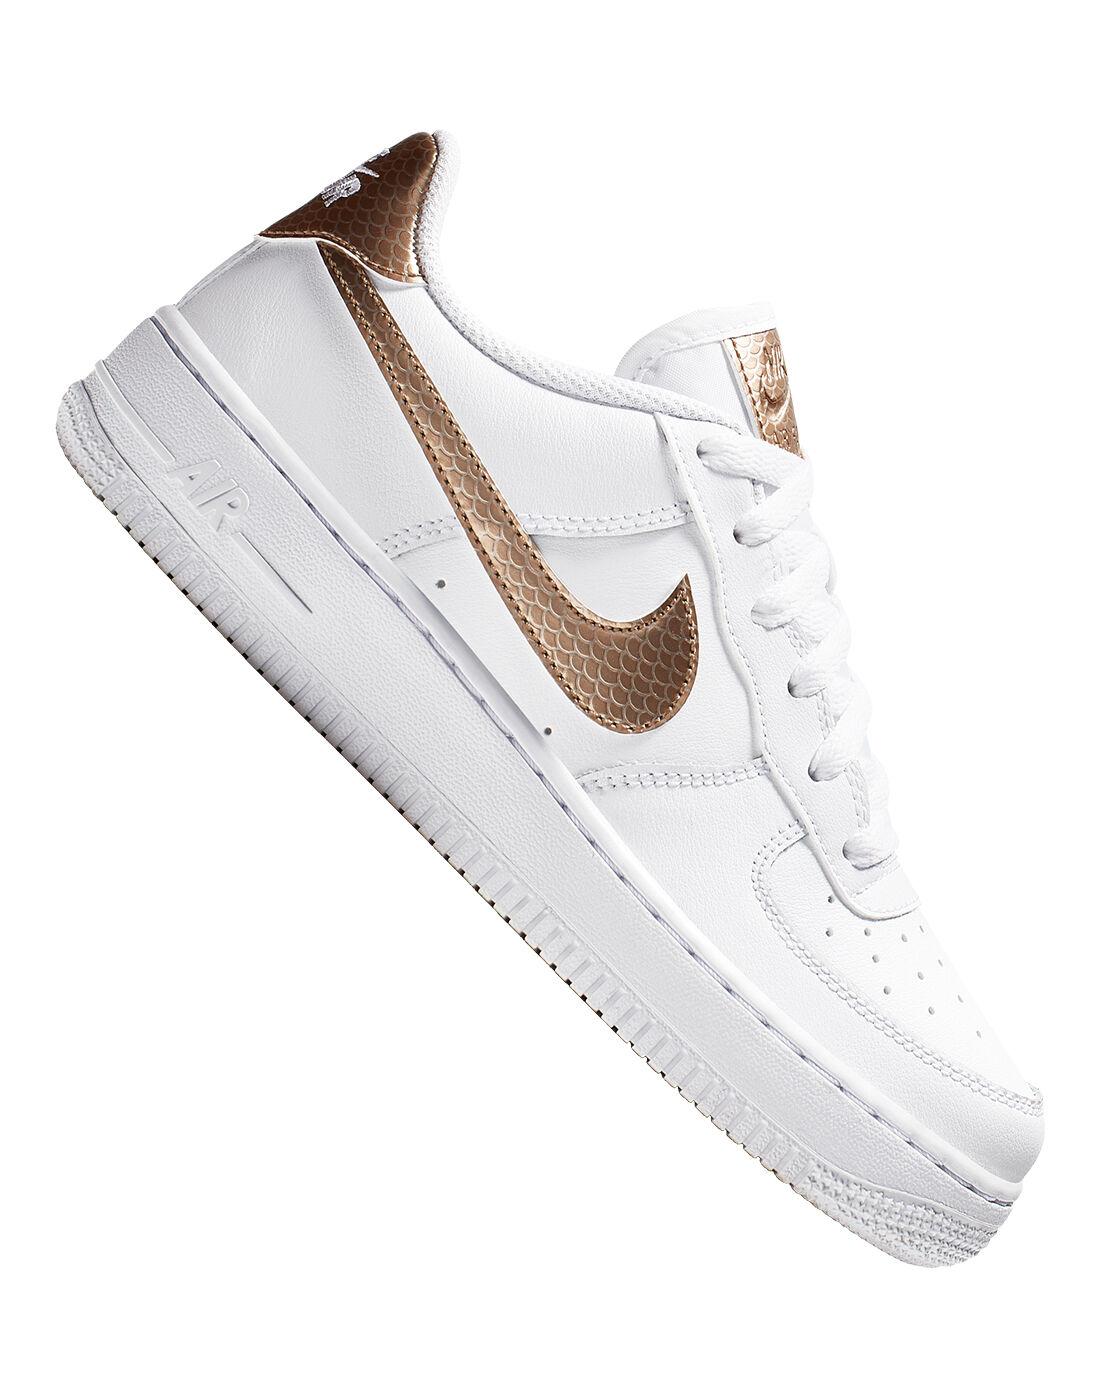 White \u0026 Metallic Nike Air Force 1